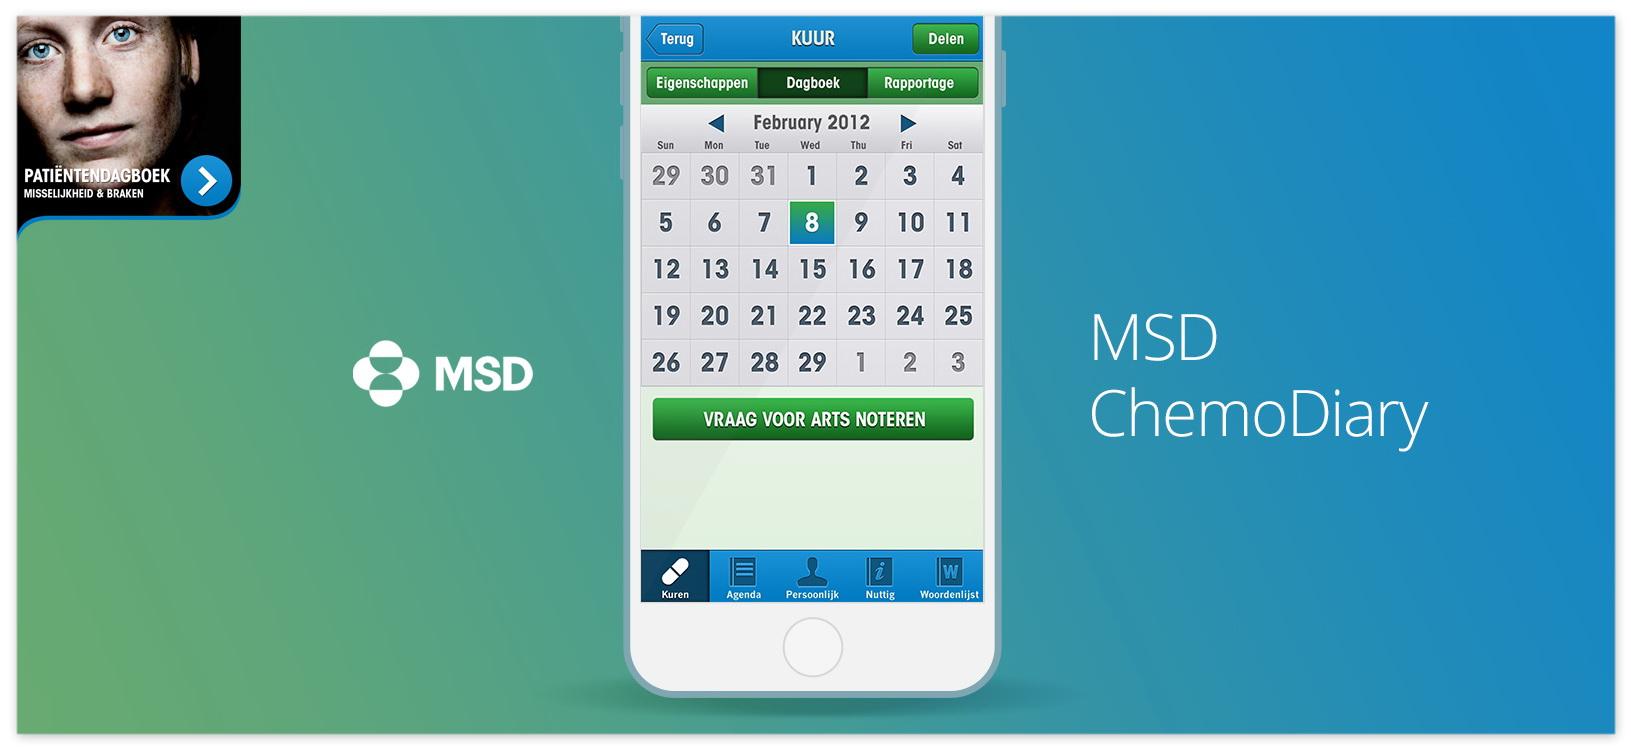 MSD ChemoDiary Patient Engagement App large